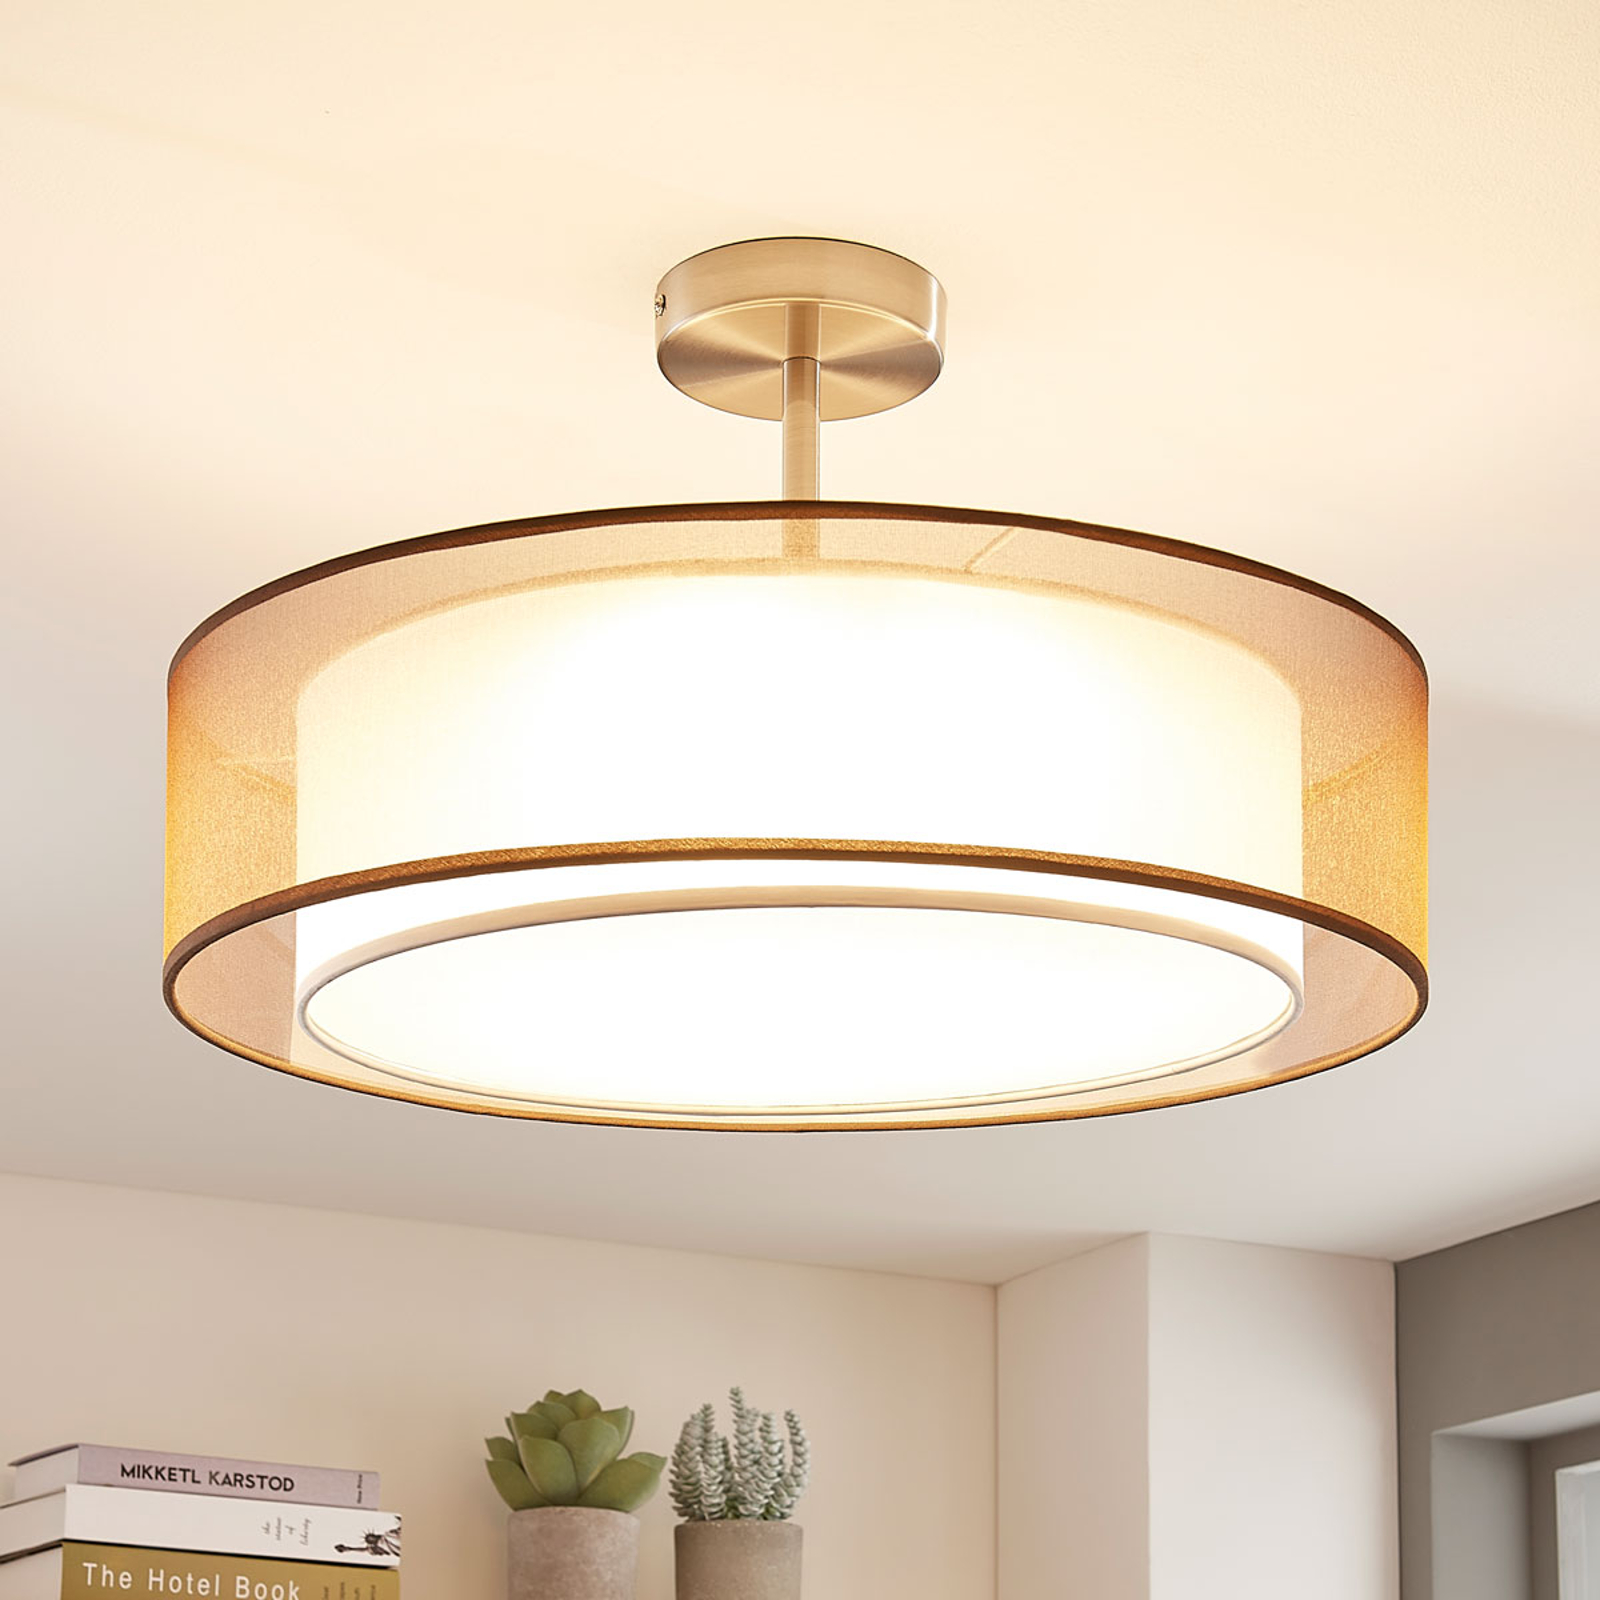 Pikka LED-loftlampe, 3 trin dæmpbar, brun